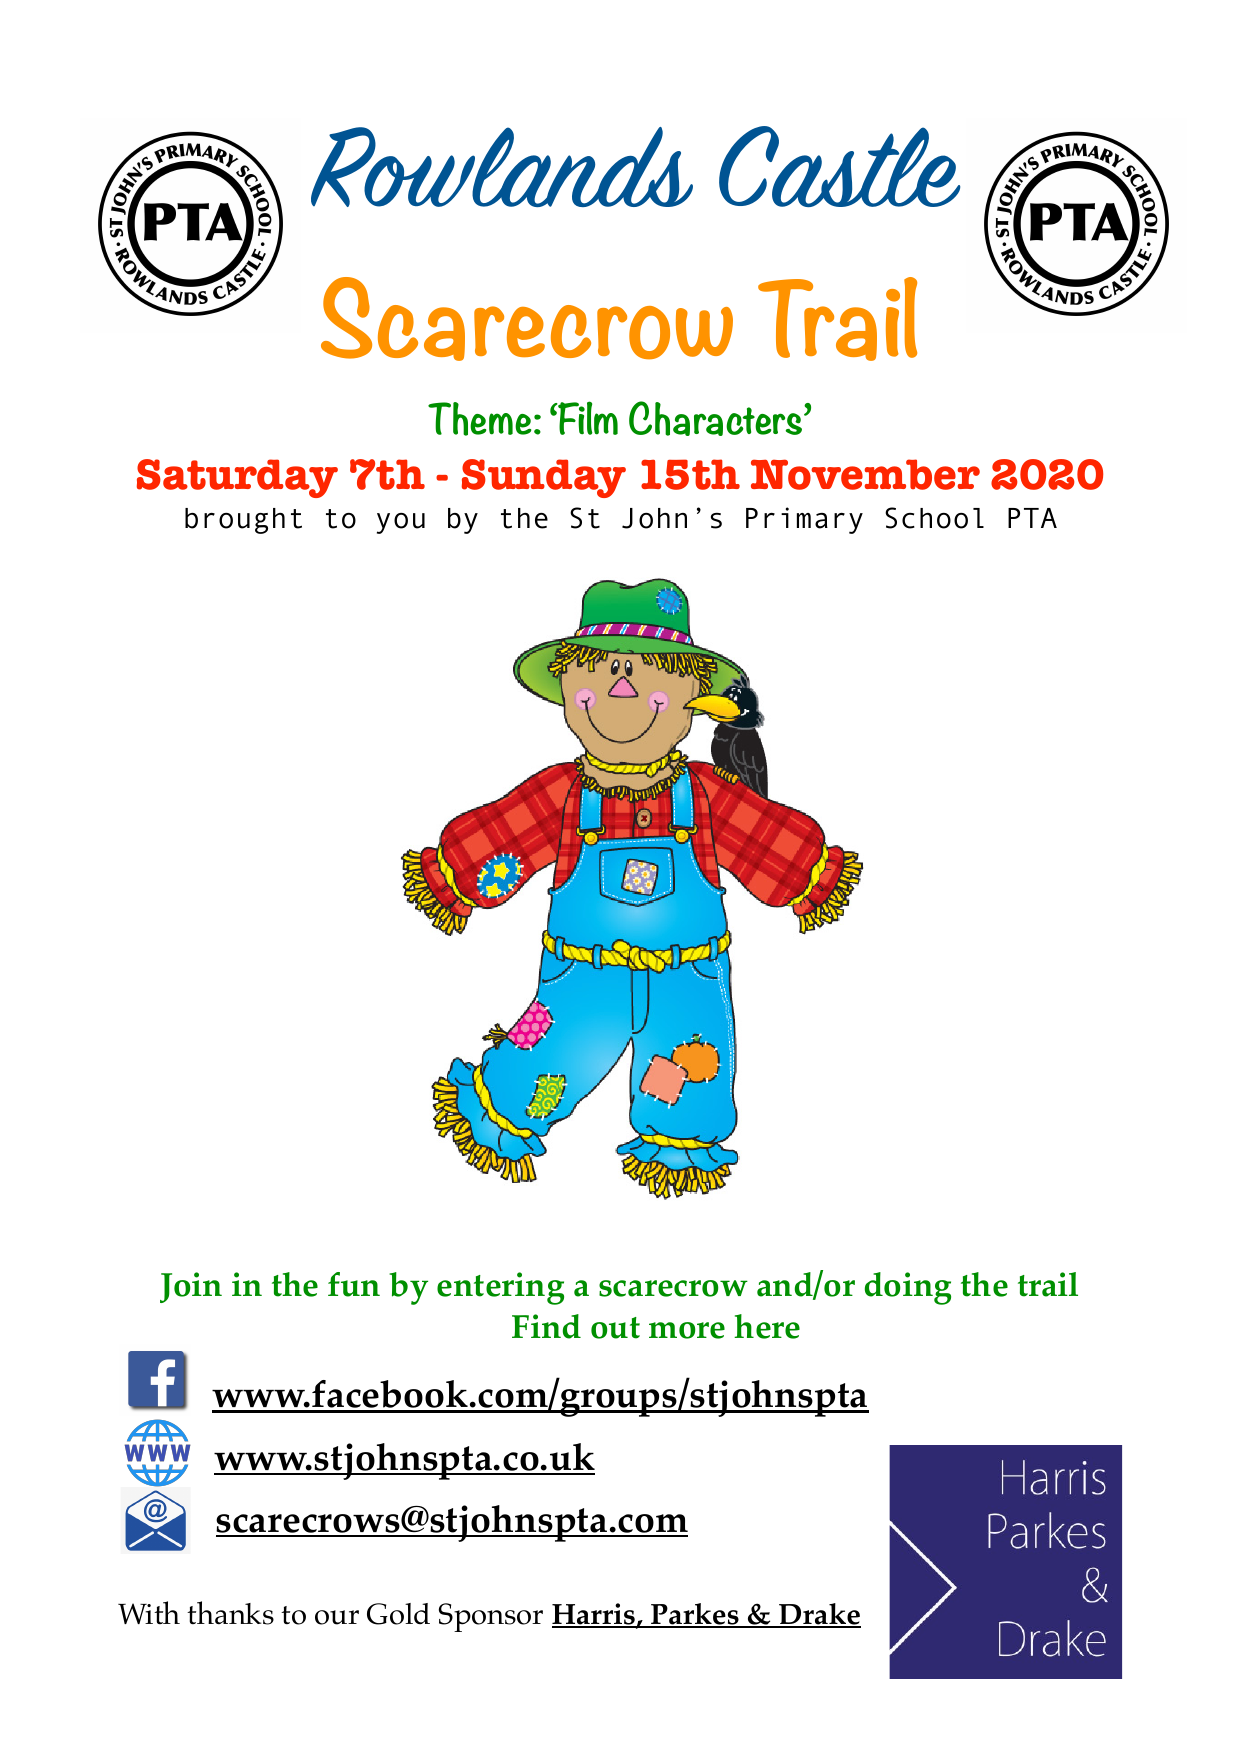 Rowlands Castle Scarecrow Trail 2020